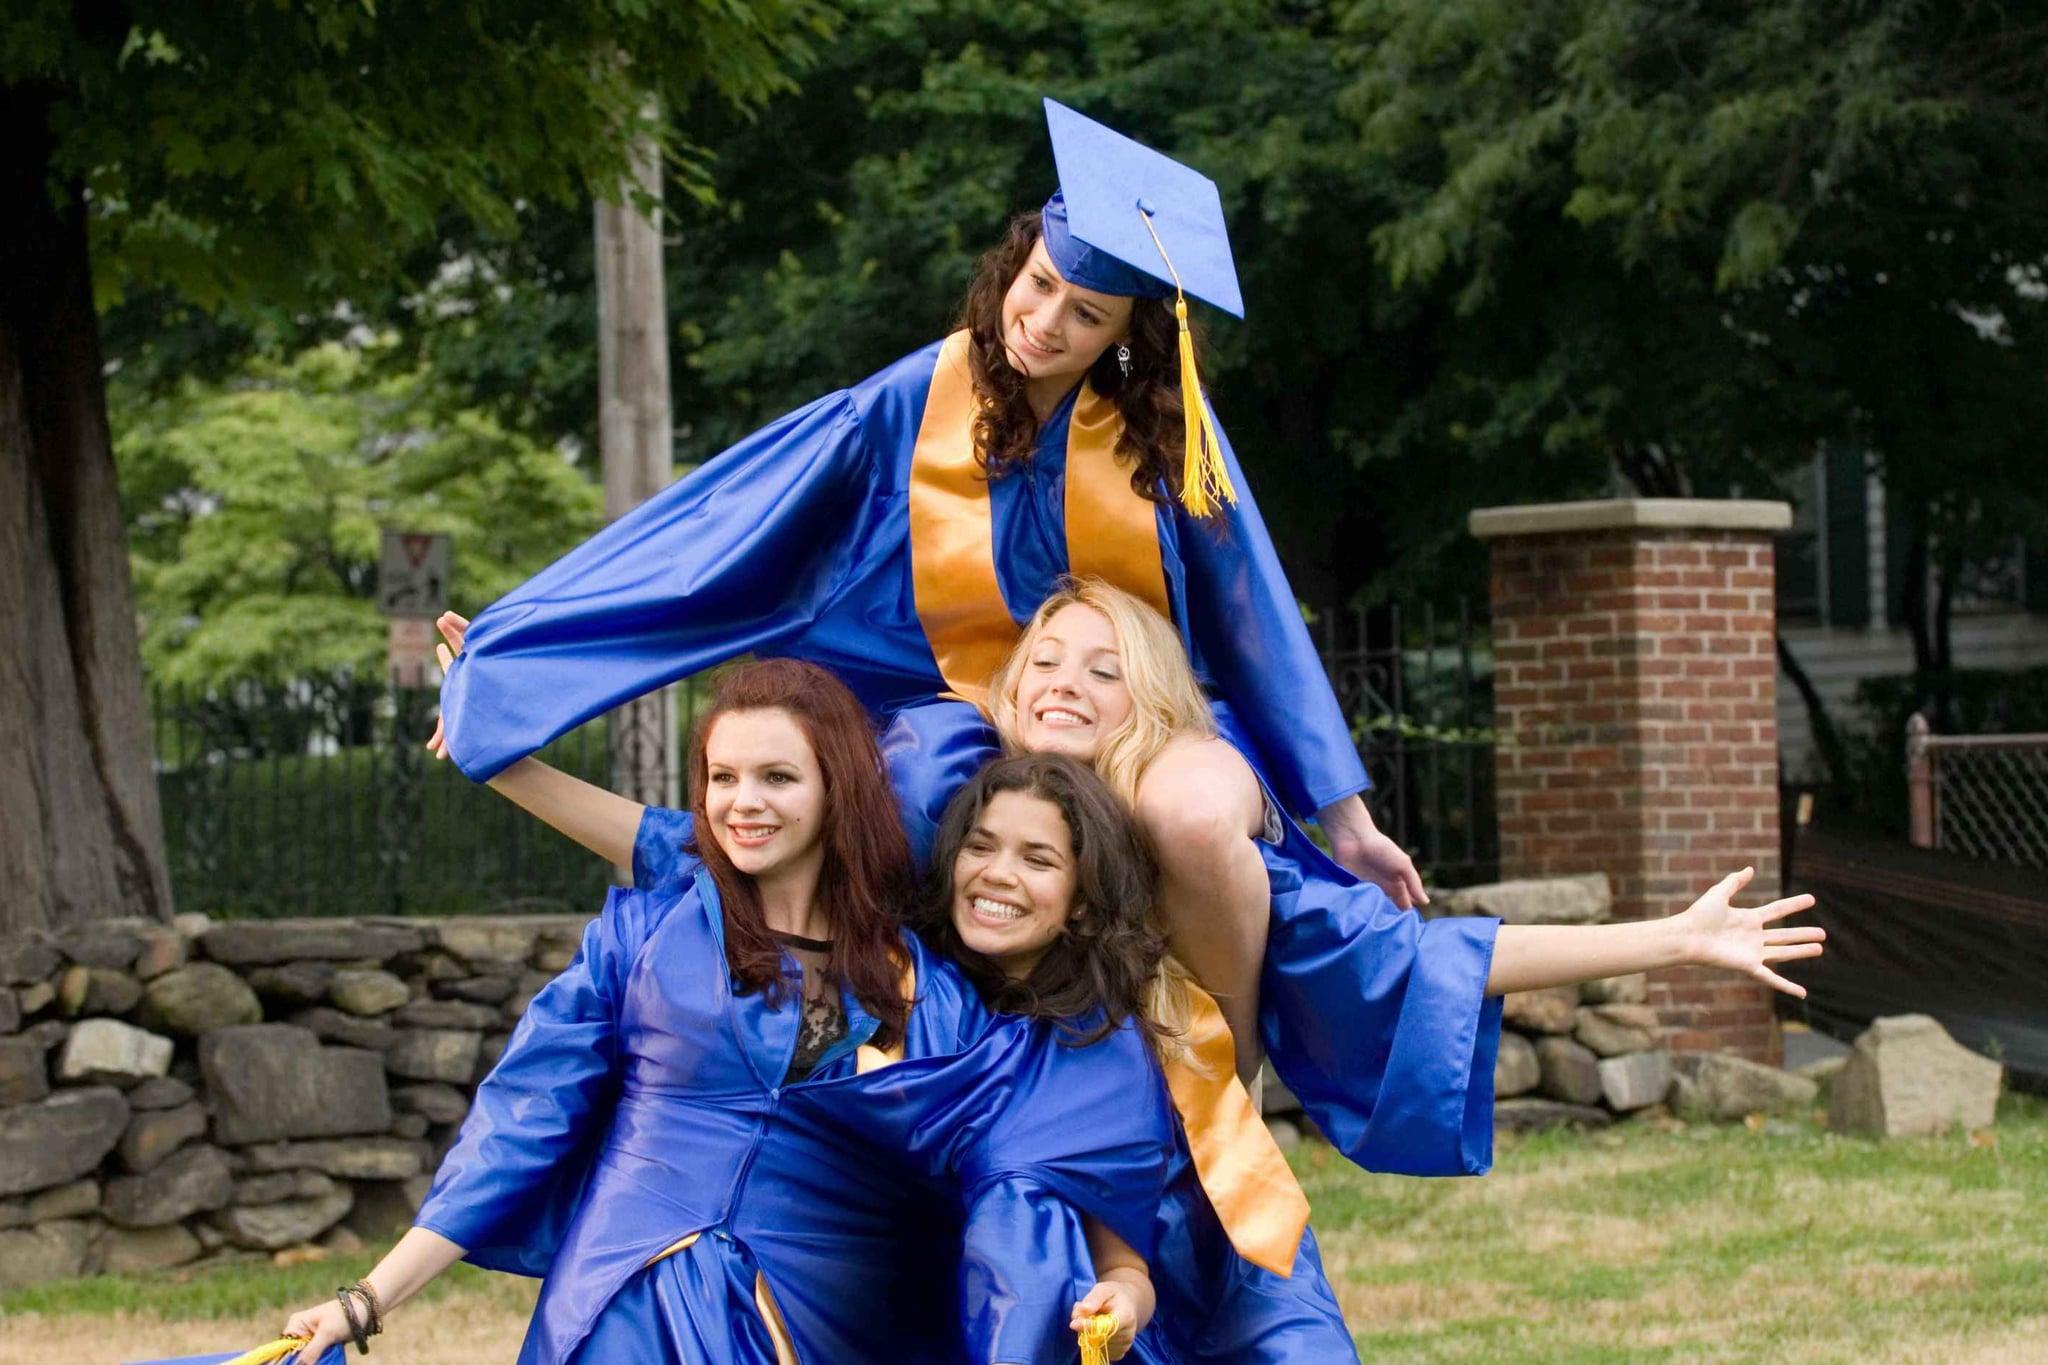 the sisterhood of the traveling pants 2 onscreen